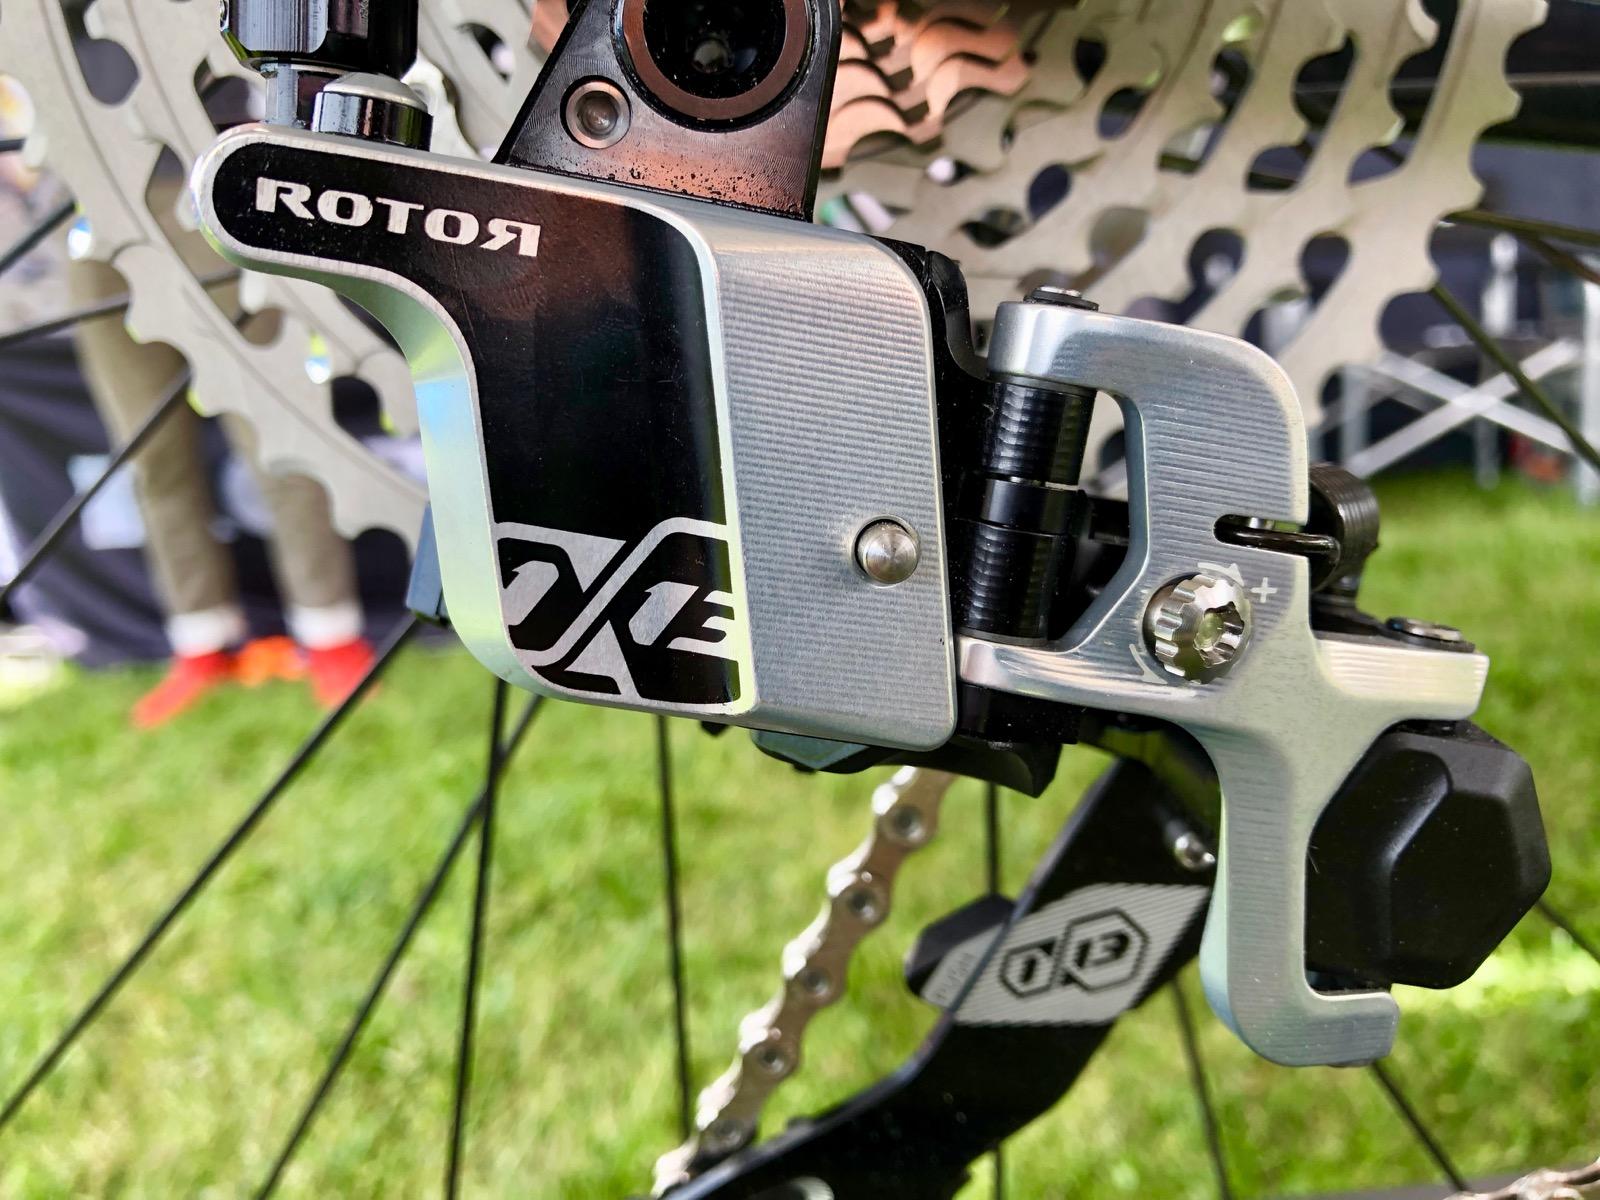 Rotor's 13-speed MTB Drivetrain Inches Forward, New e*thirteen Cassette Boasts 556% Range